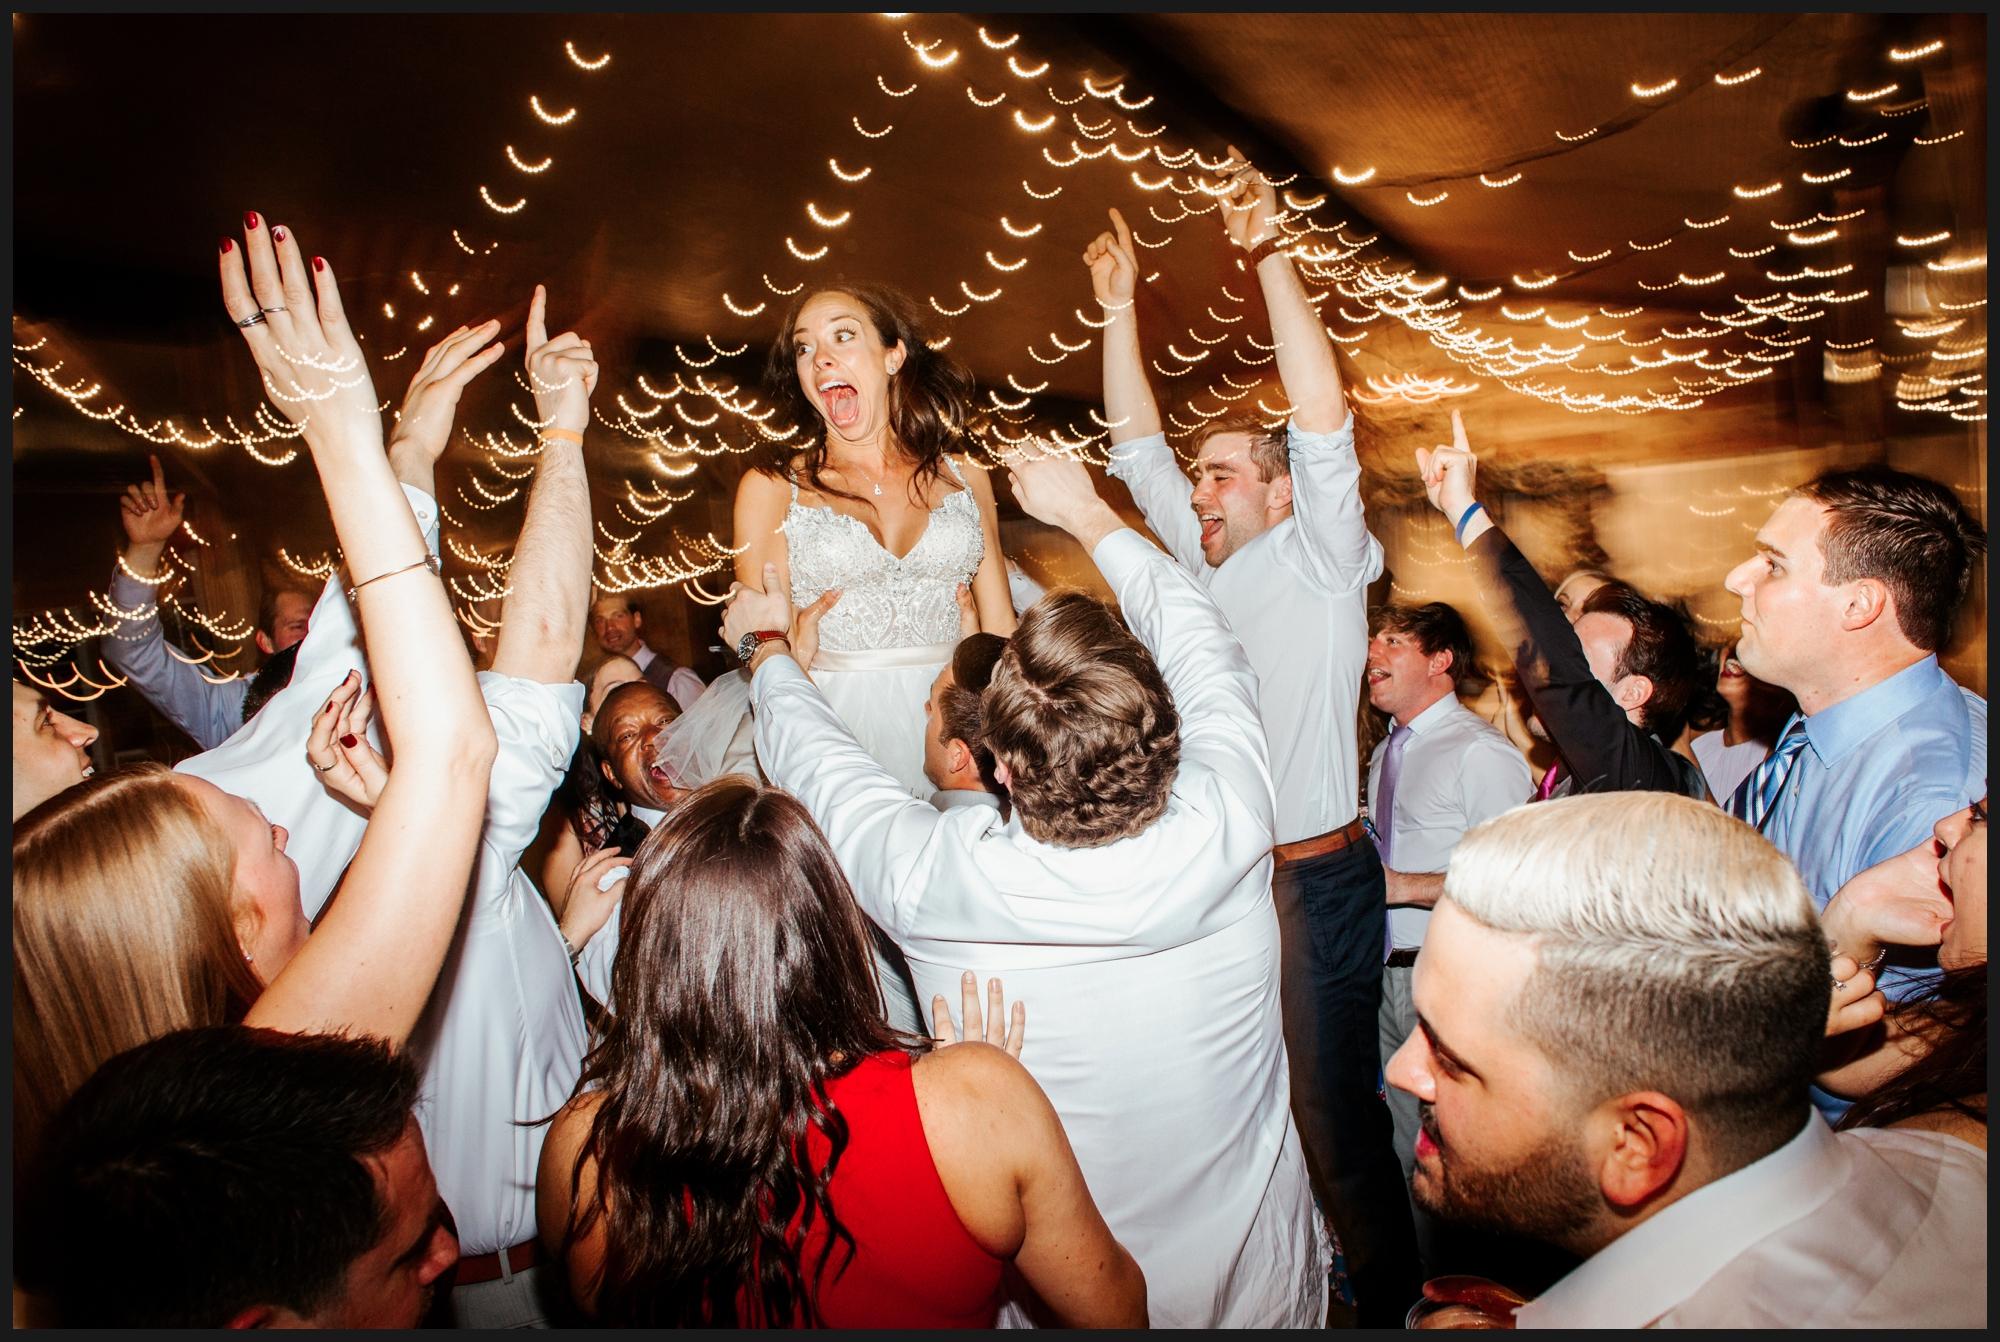 Orlando-Wedding-Photographer-destination-wedding-photographer-florida-wedding-photographer-bohemian-wedding-photographer_1650.jpg